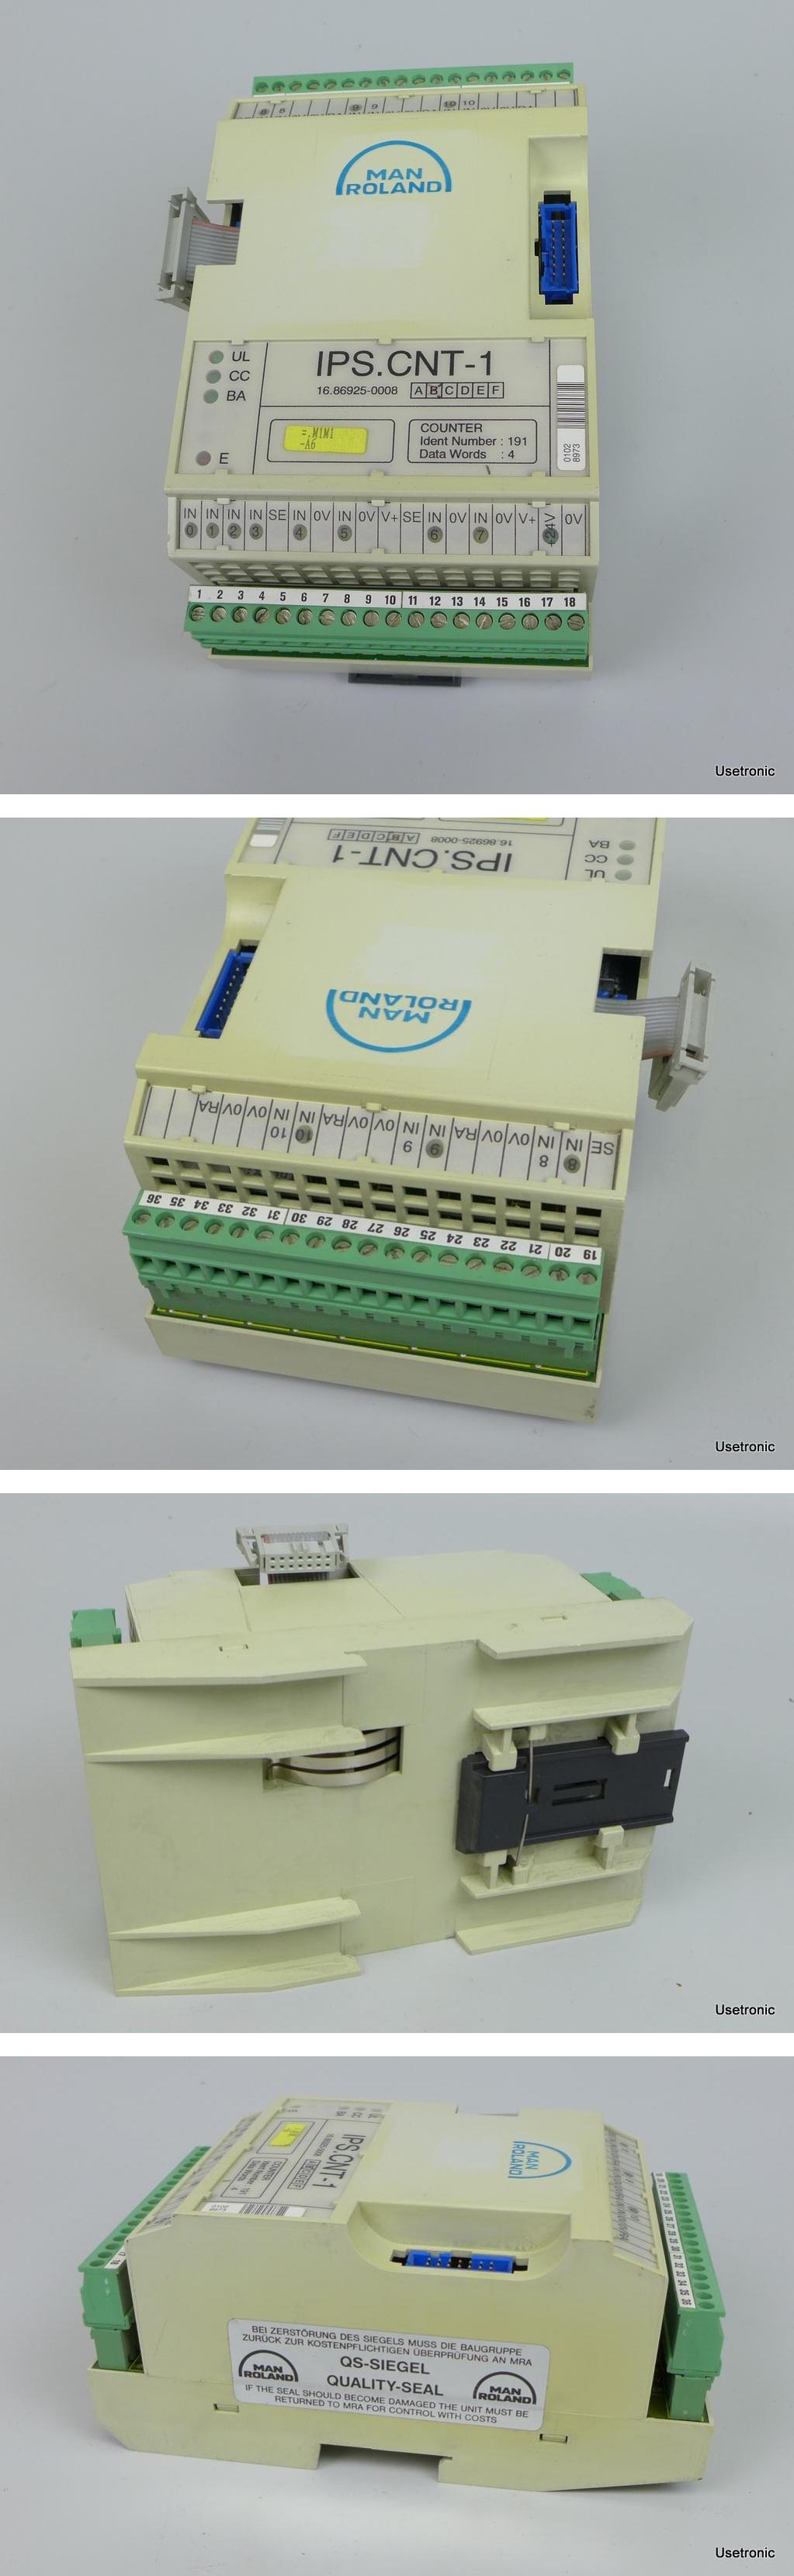 MAN Roland IPS.CNT-1 16.86925